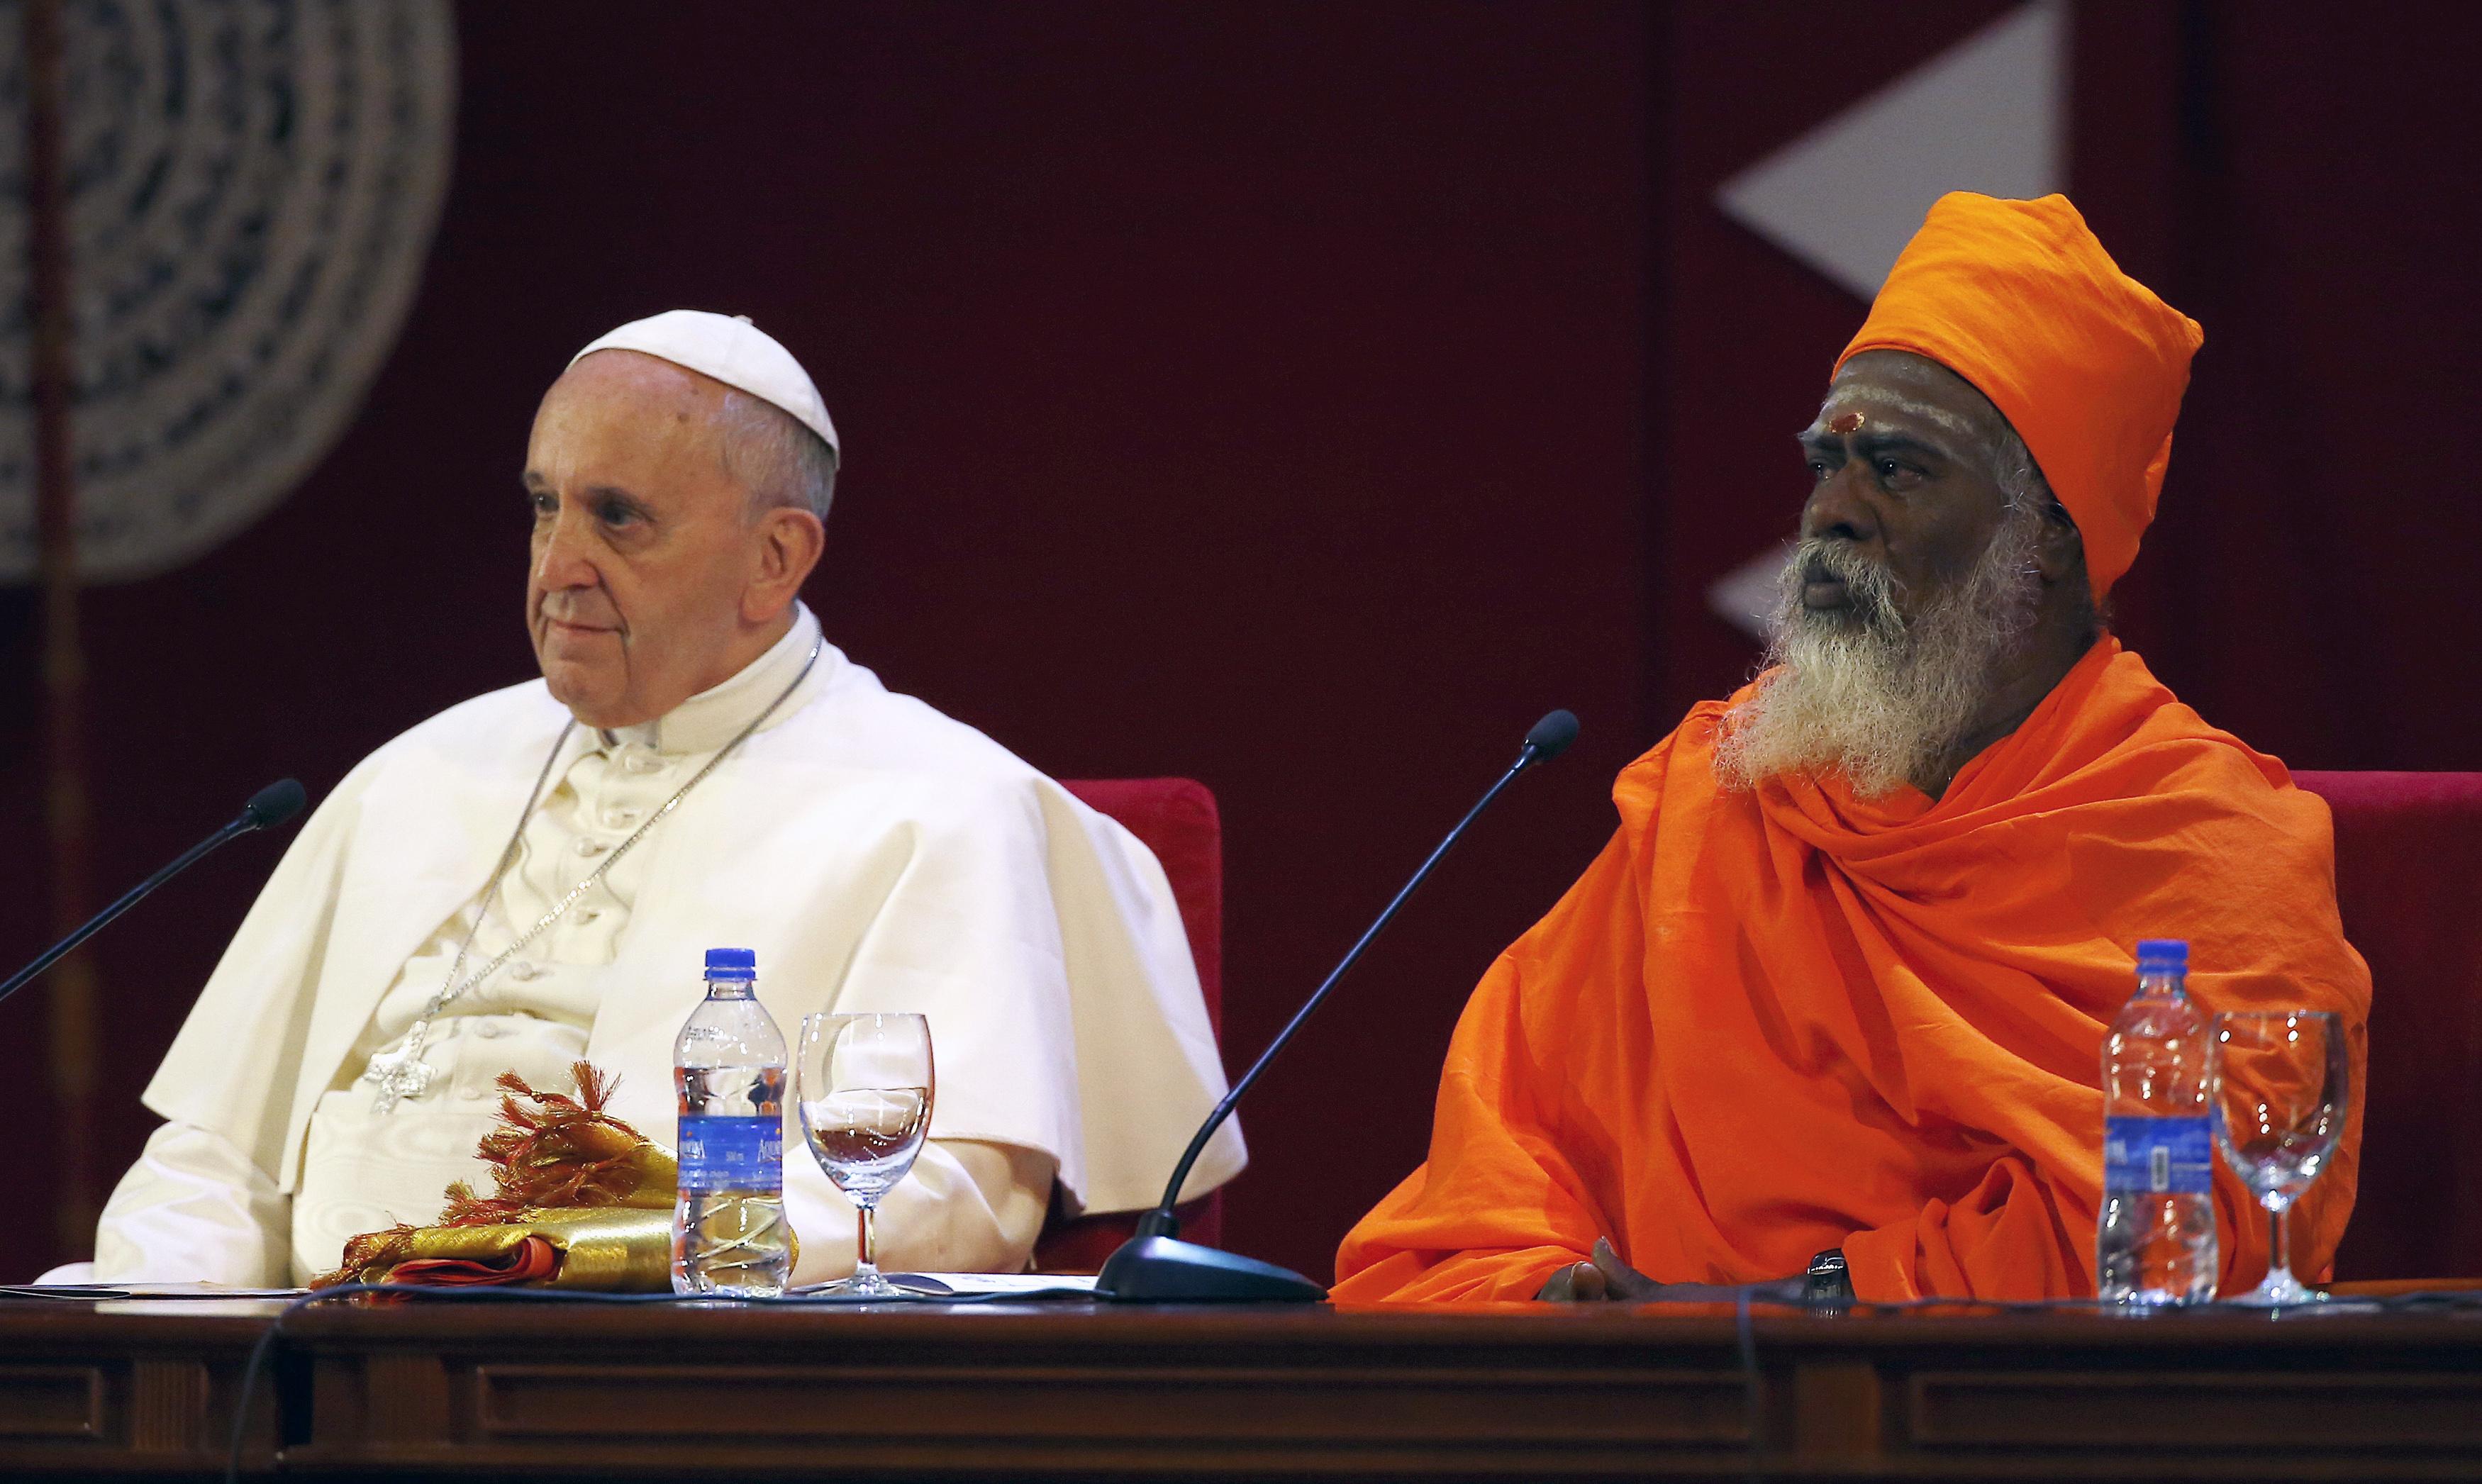 Pope Francis sits next to Hindu leader Ndu-Kurukkal SivaSri T. Mahadeva during the Interreligious Encounter in Colombo, Sri Lanka on January 13, 2015.